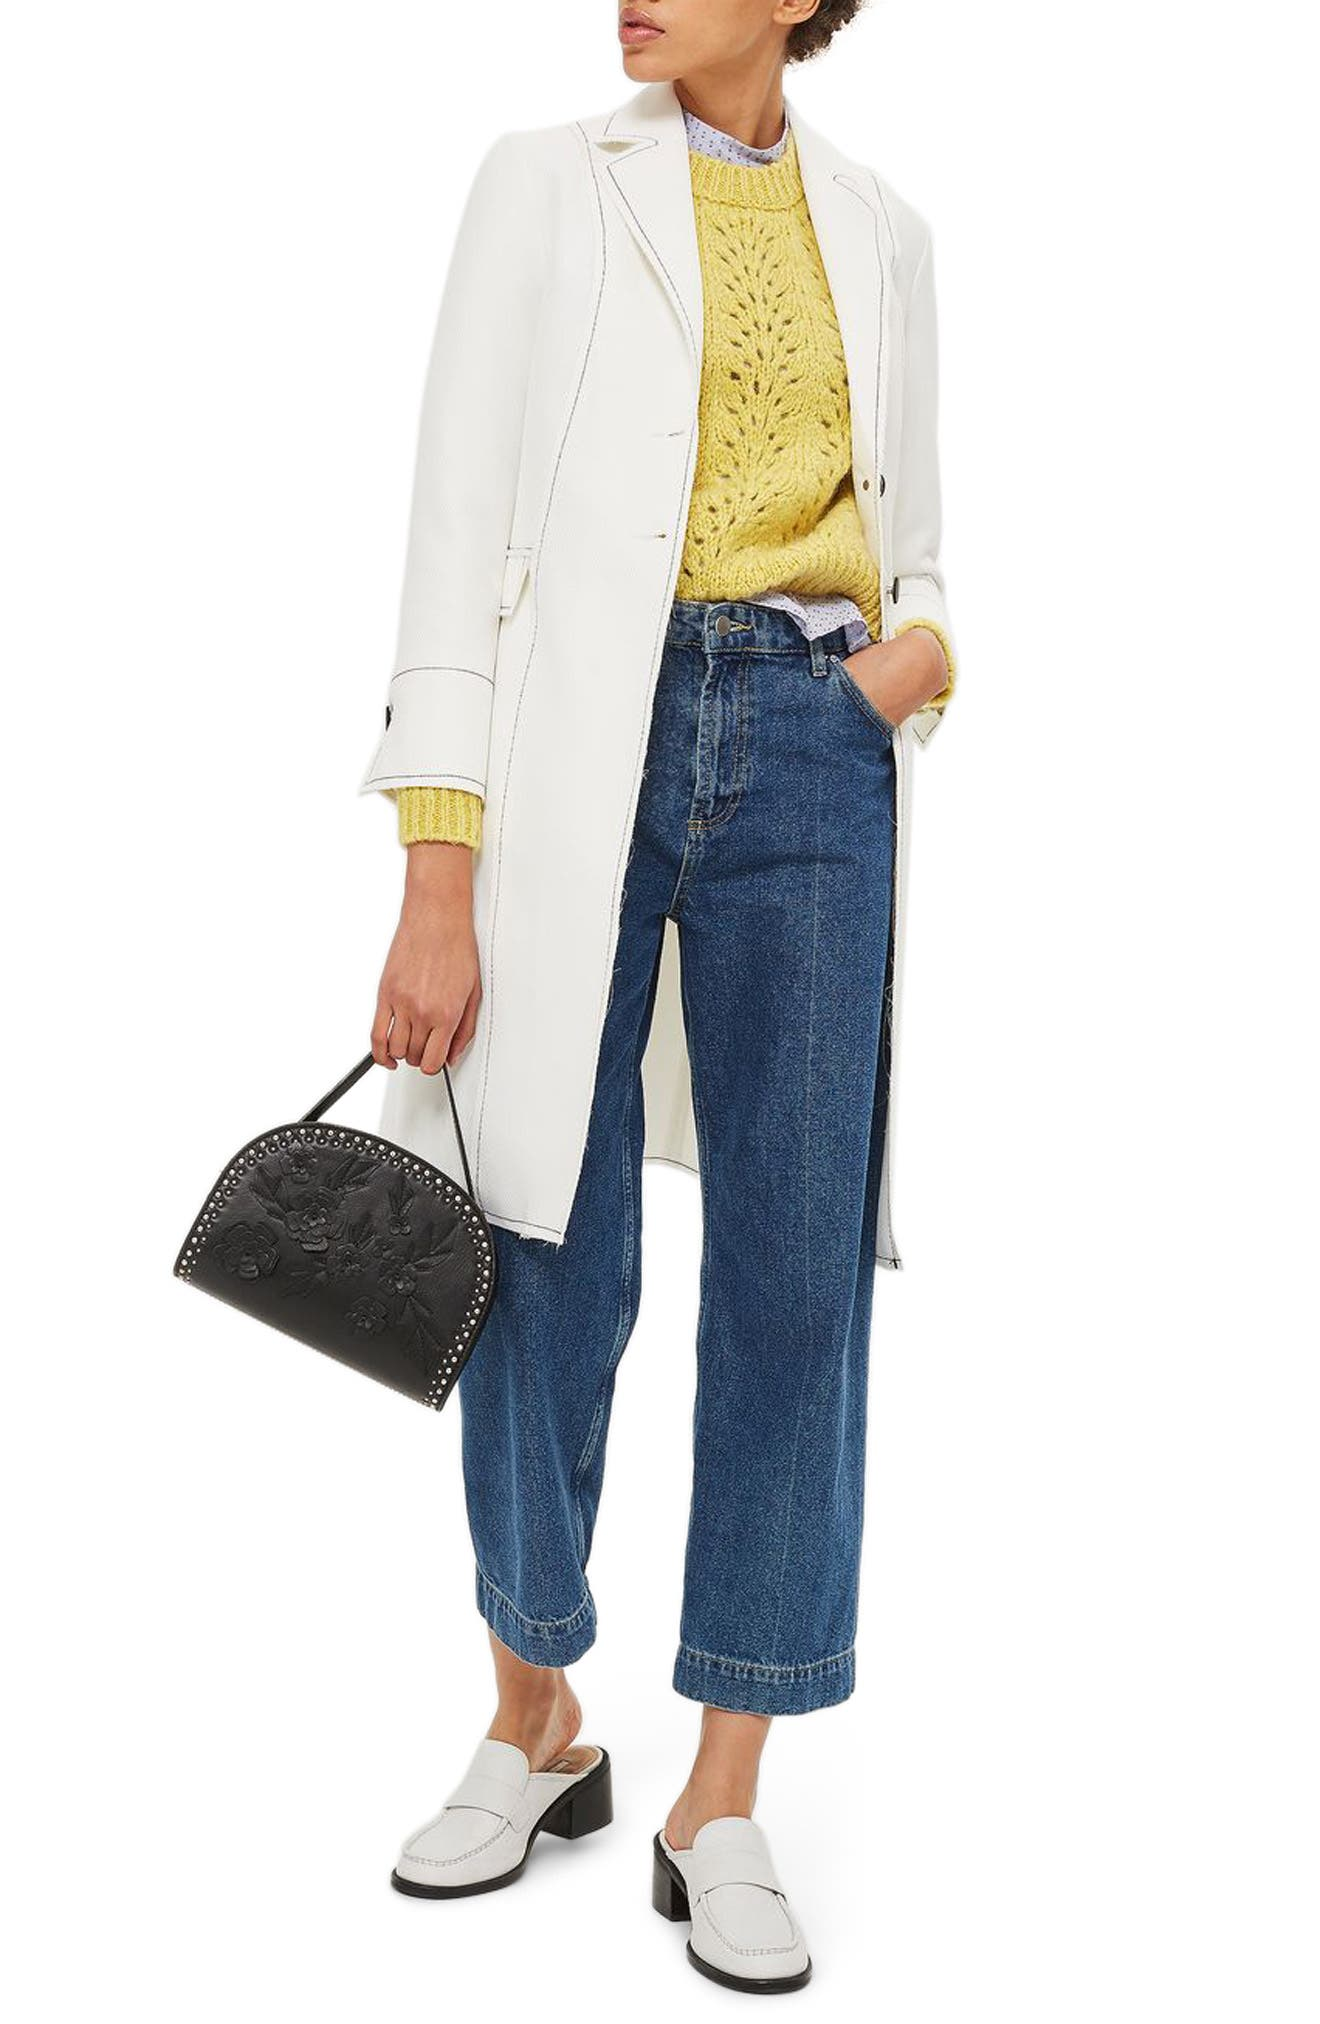 Topshop Contrast Stitch Twill Coat